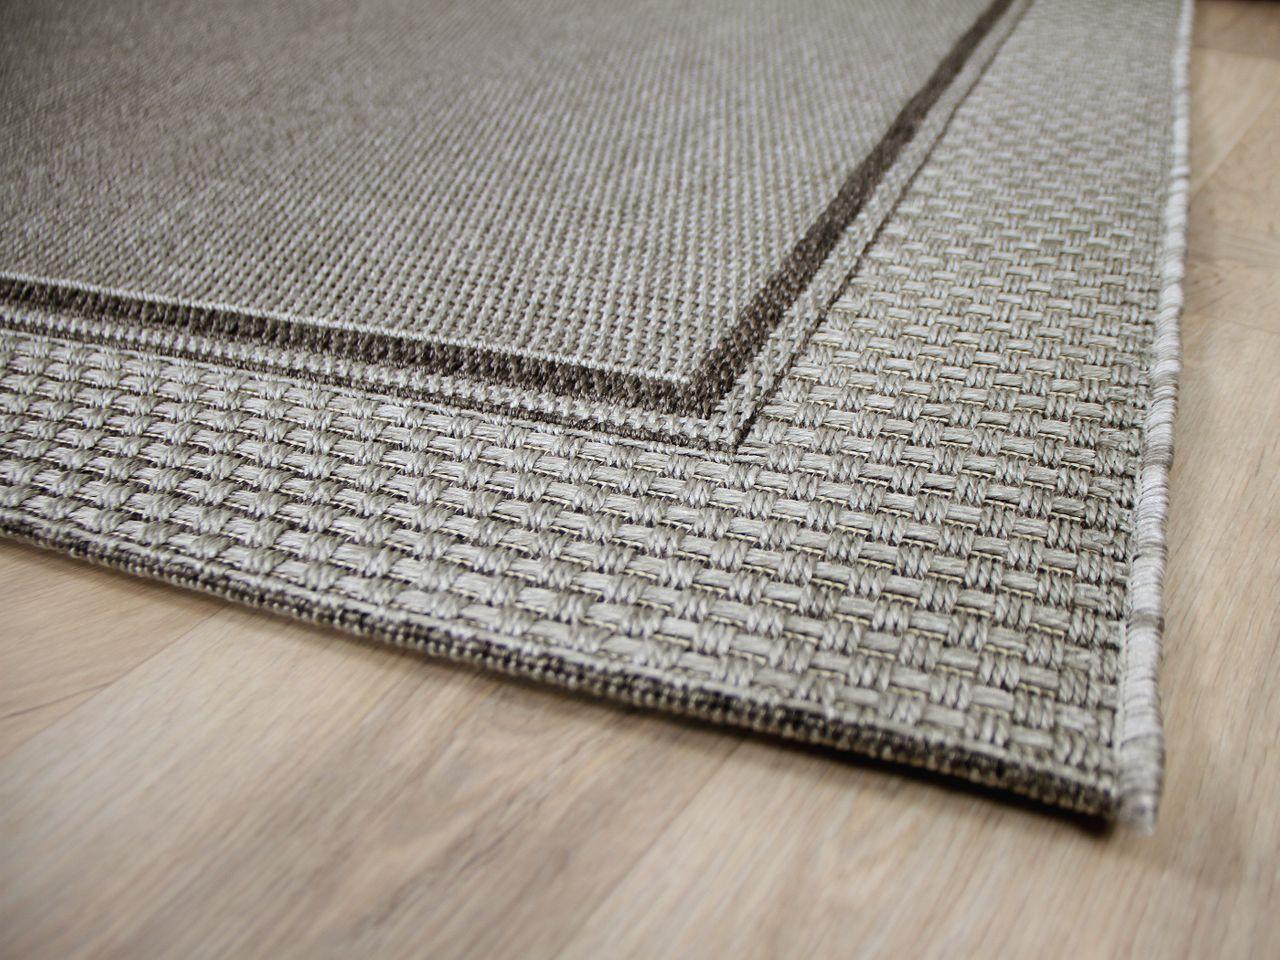 In Outdoor Teppich Flachgewebe Natur Panama Grau Bordure Kaufen